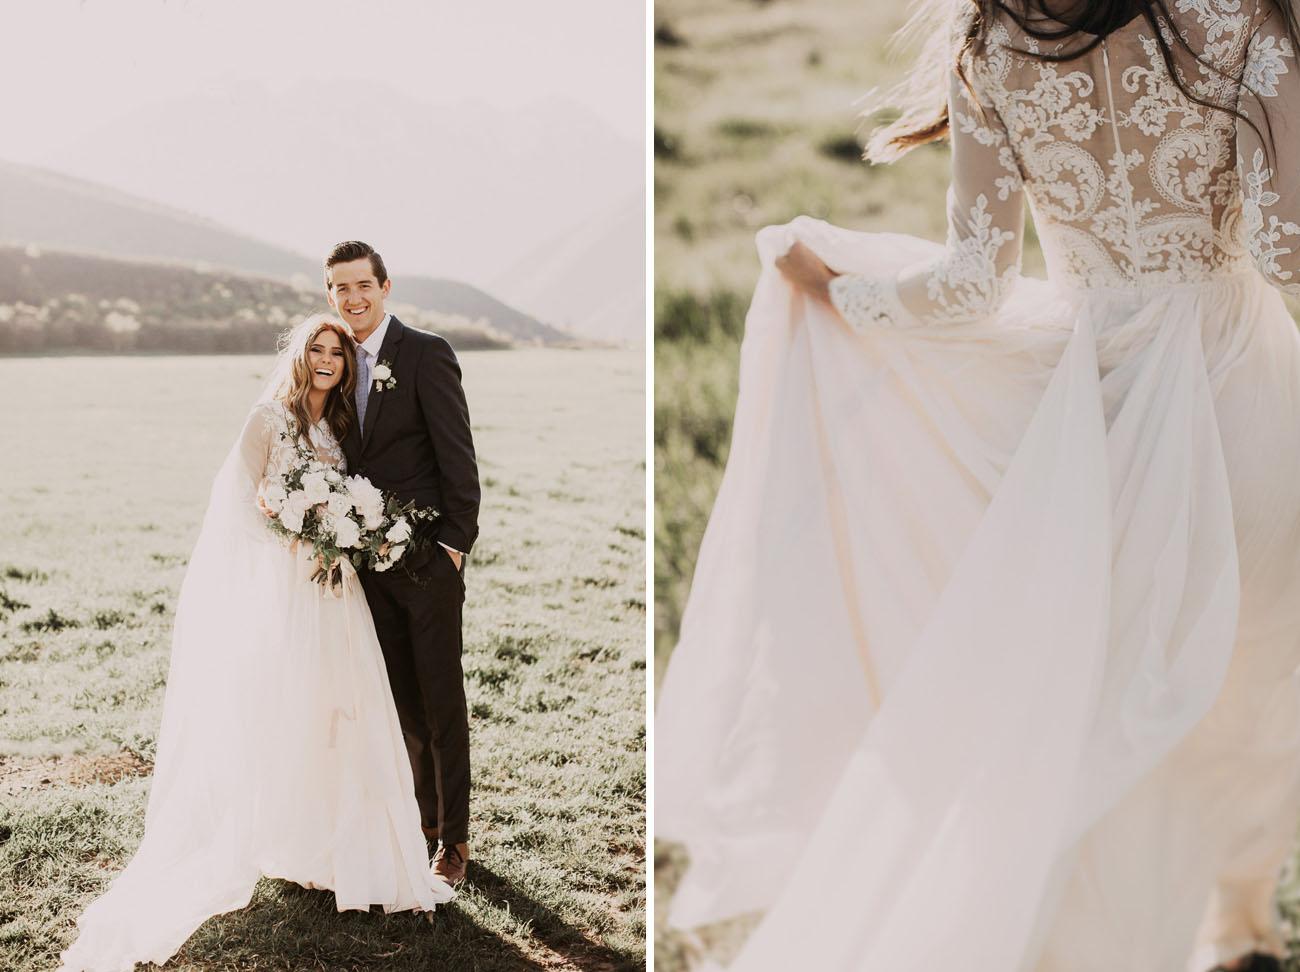 Marcus and gabby wedding